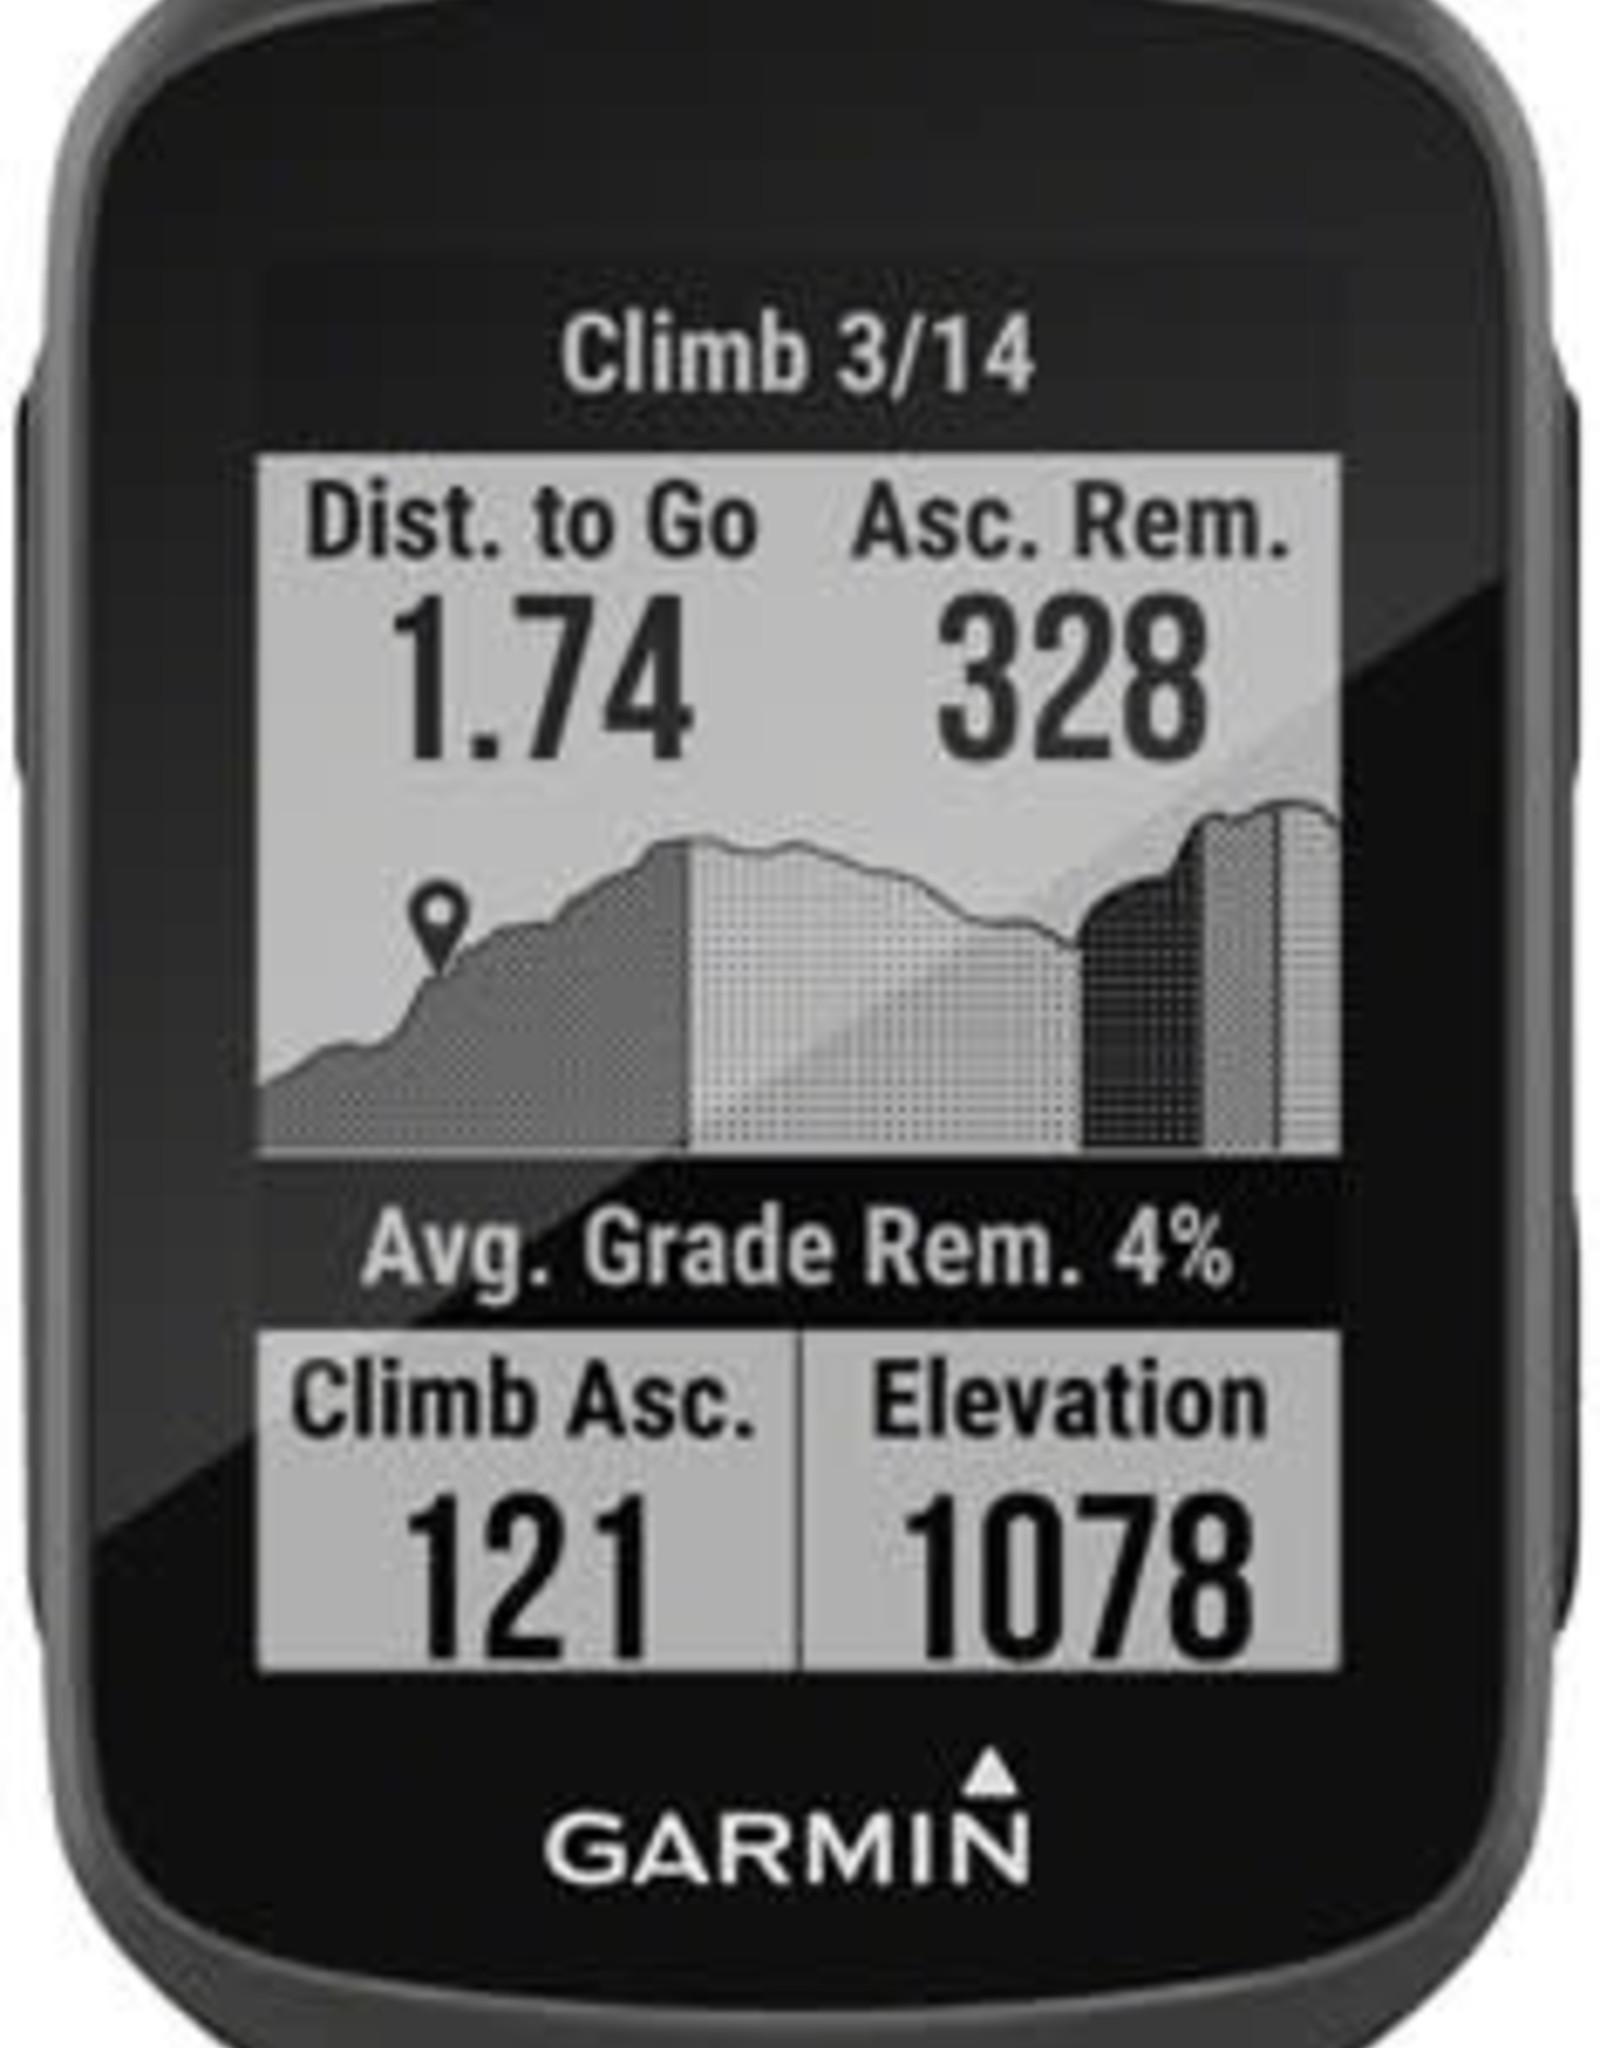 Garmin Garmin Edge 130 Plus Bike Computer - GPS, Wireless, Black